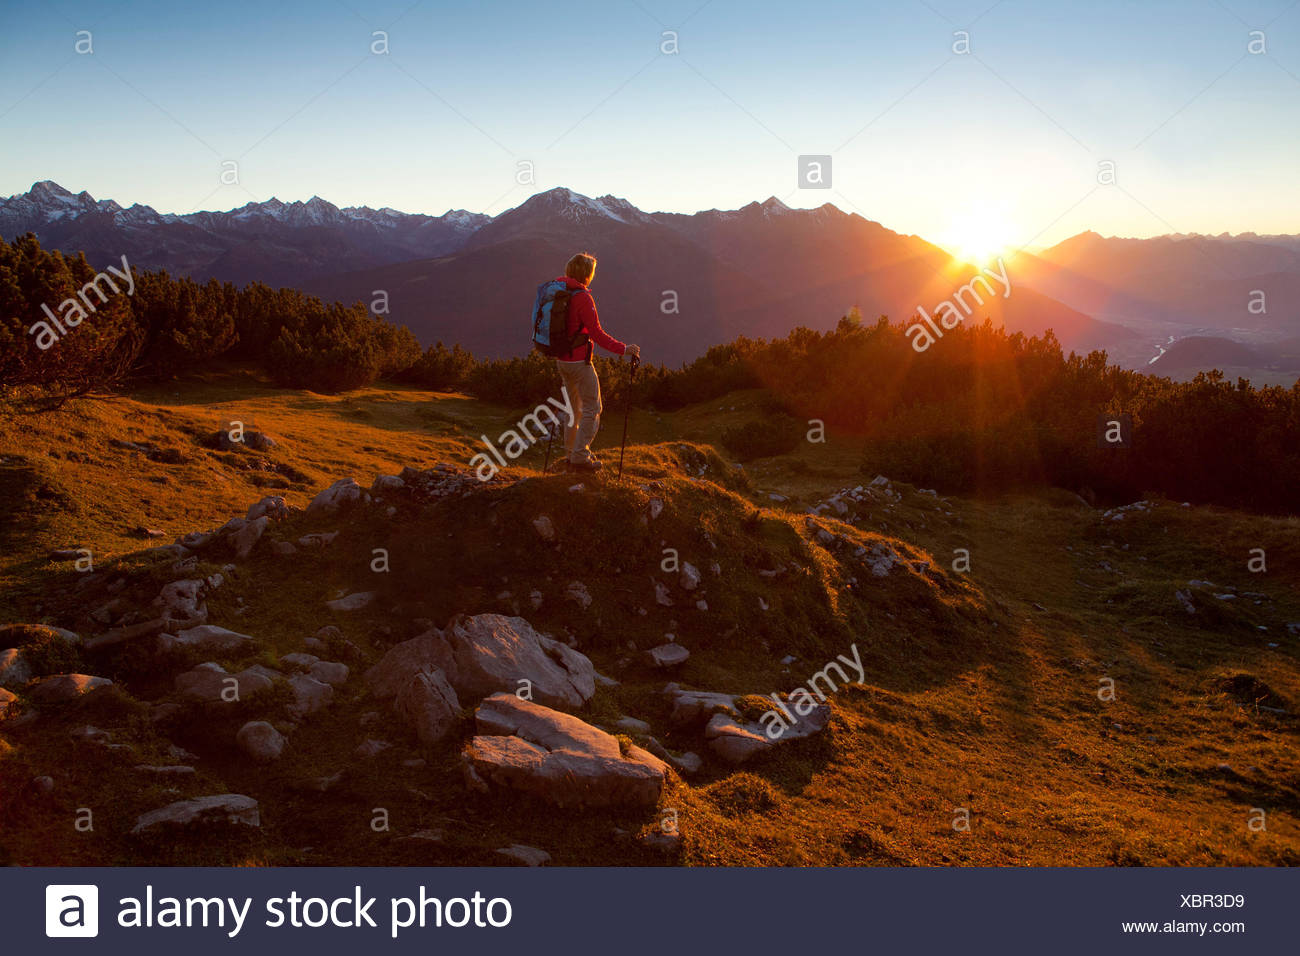 Austria, Tyrol, Obsteig, sunrise in the Simmering - Stock Image